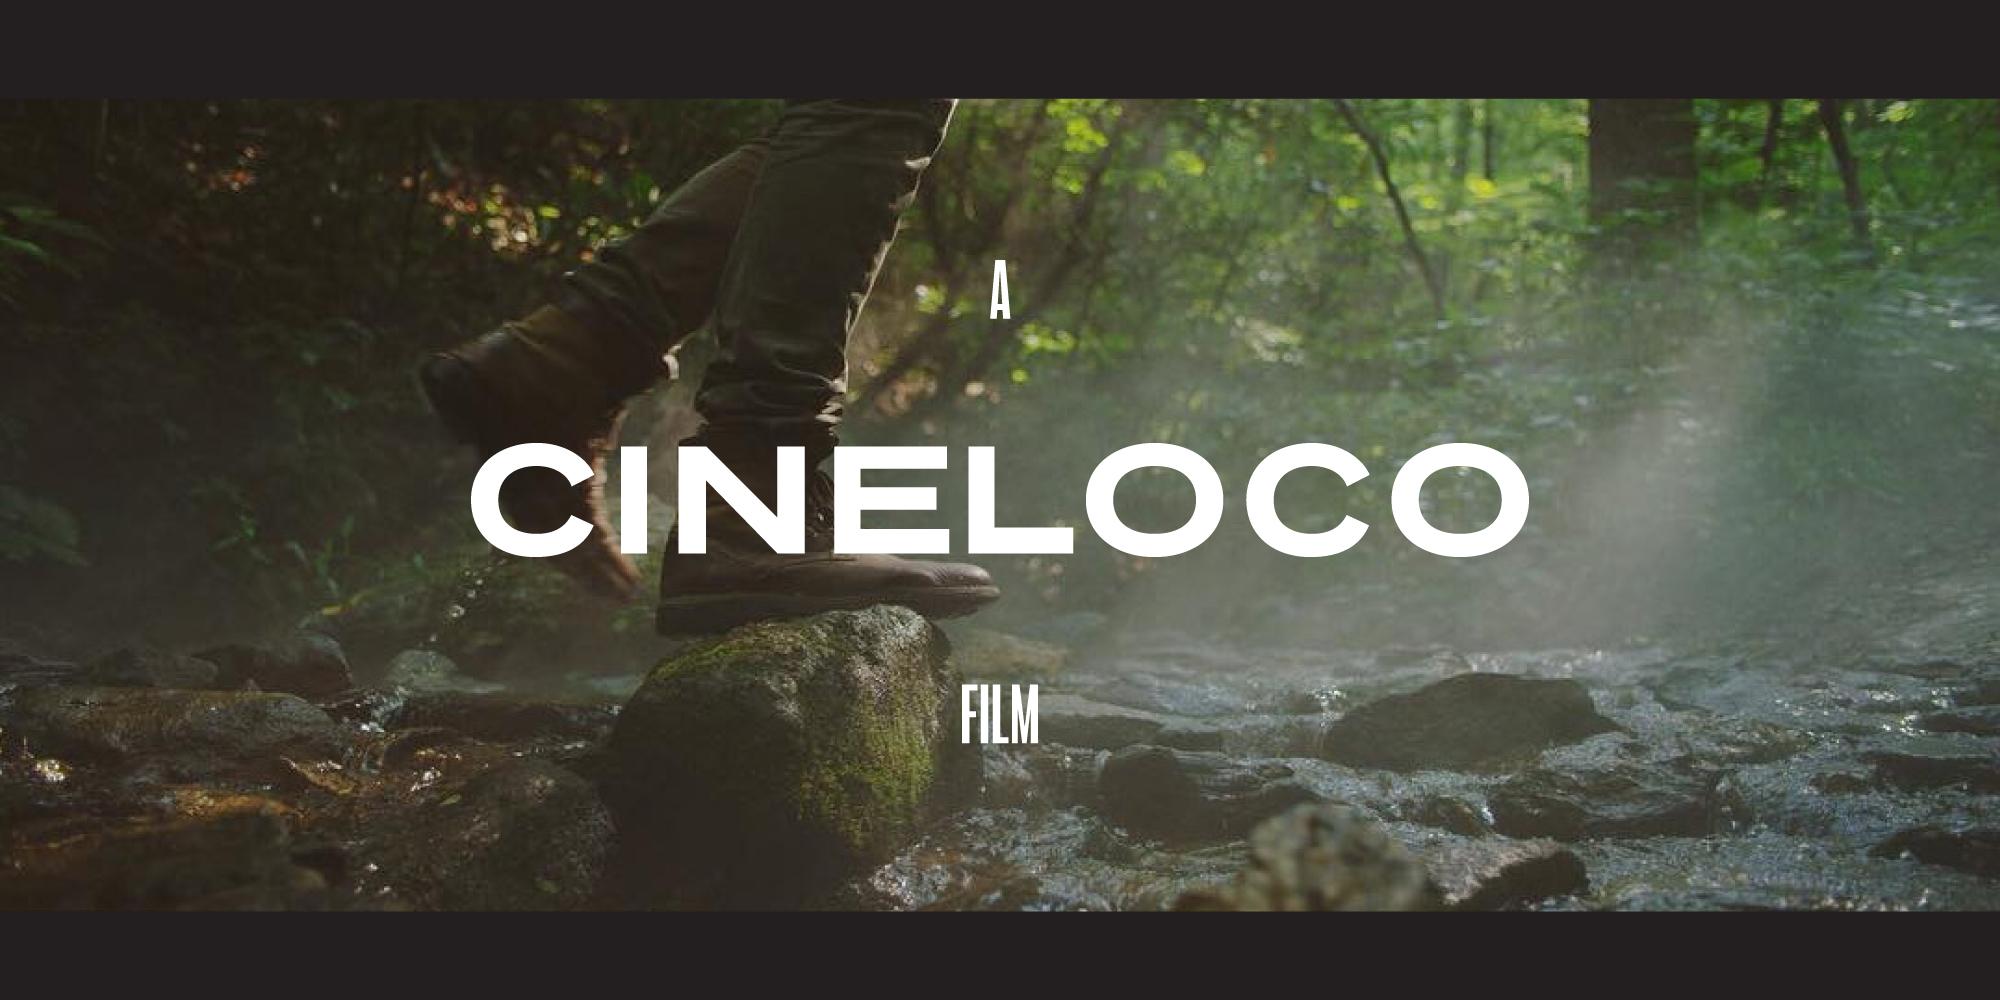 Cineloco_7.jpg